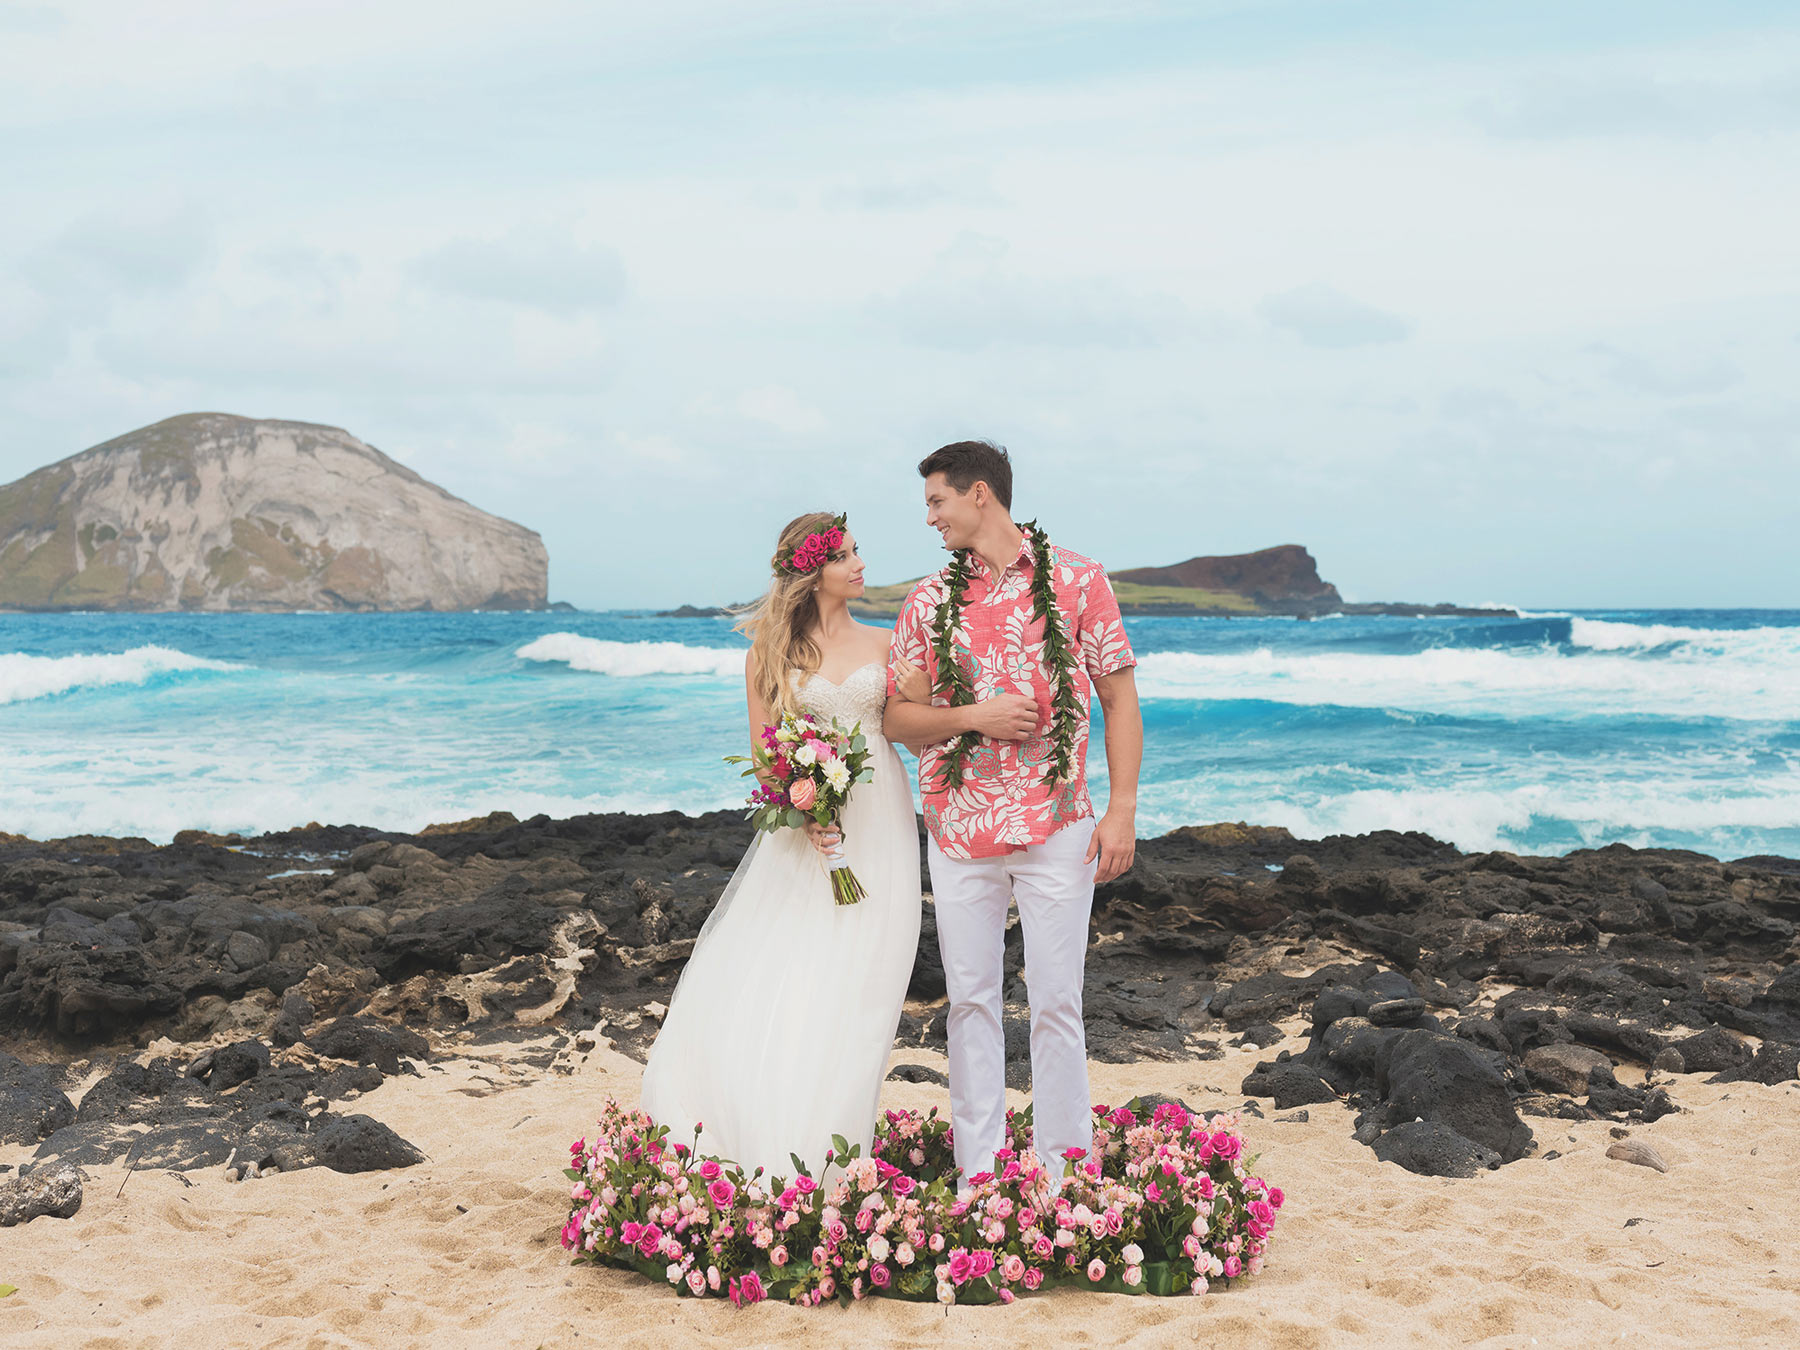 Hawaii Destination Wedding.Hawaii Beach Wedding Std 하와이웨딩 라벨라하와이 Labella Hawaii